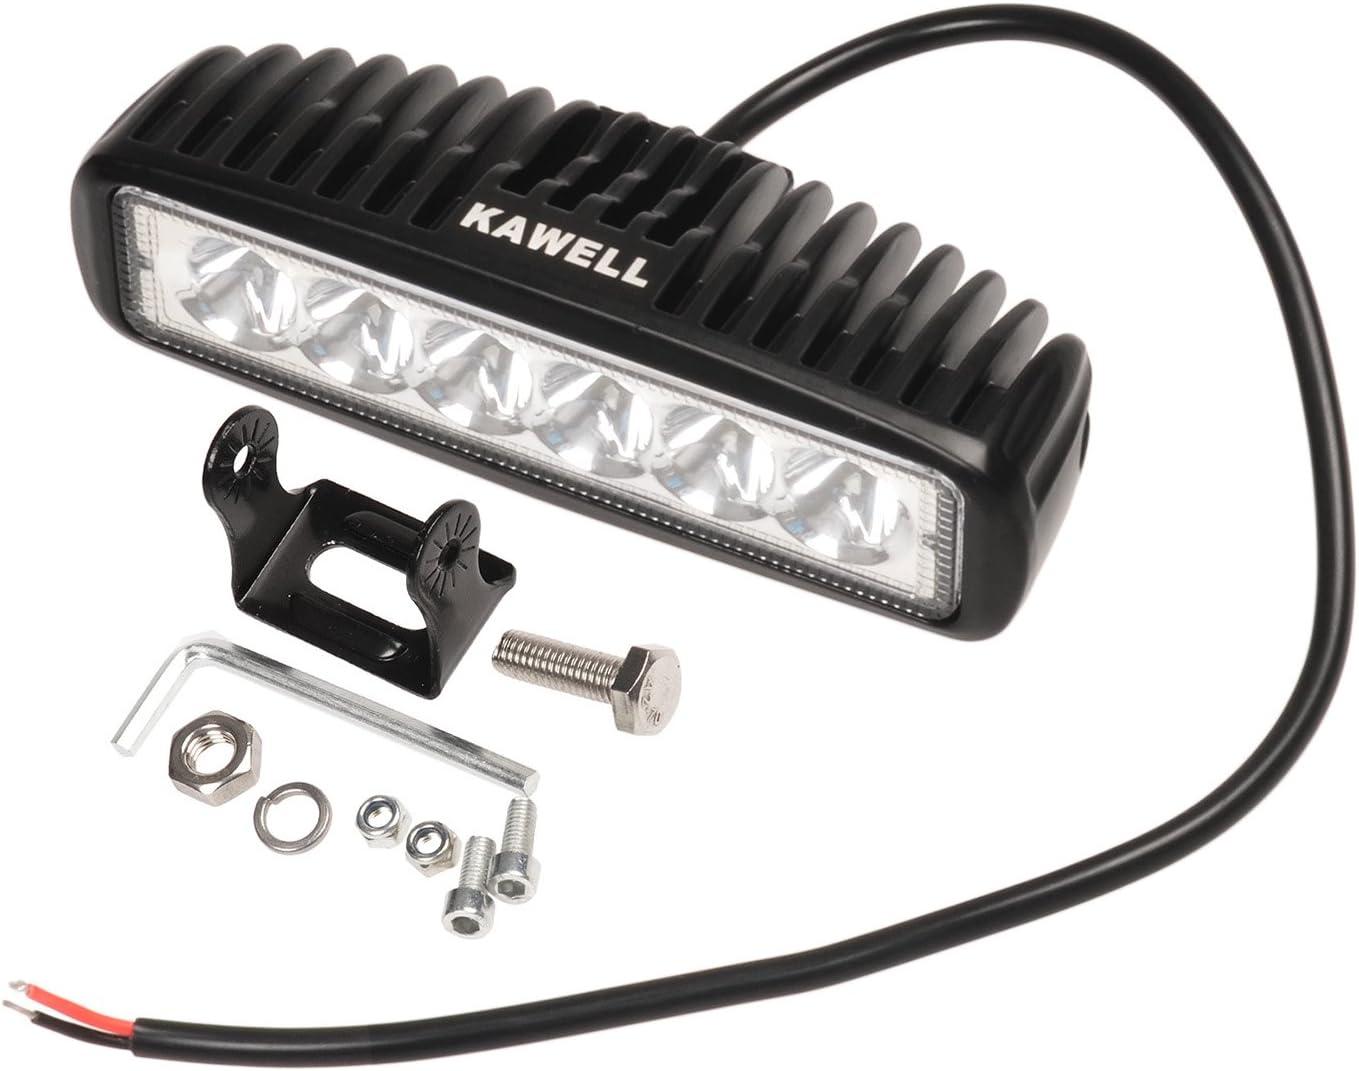 KAWELL Slim 18W LED Light Bar 6.2 DC 9-32V 6500K 1170LM 30 Degree for ATV Jeep boat suv truck car atvs light Off Road Waterproof Led Work Spot Light Bar Black Color 2 Pack Spot Black K5-5118